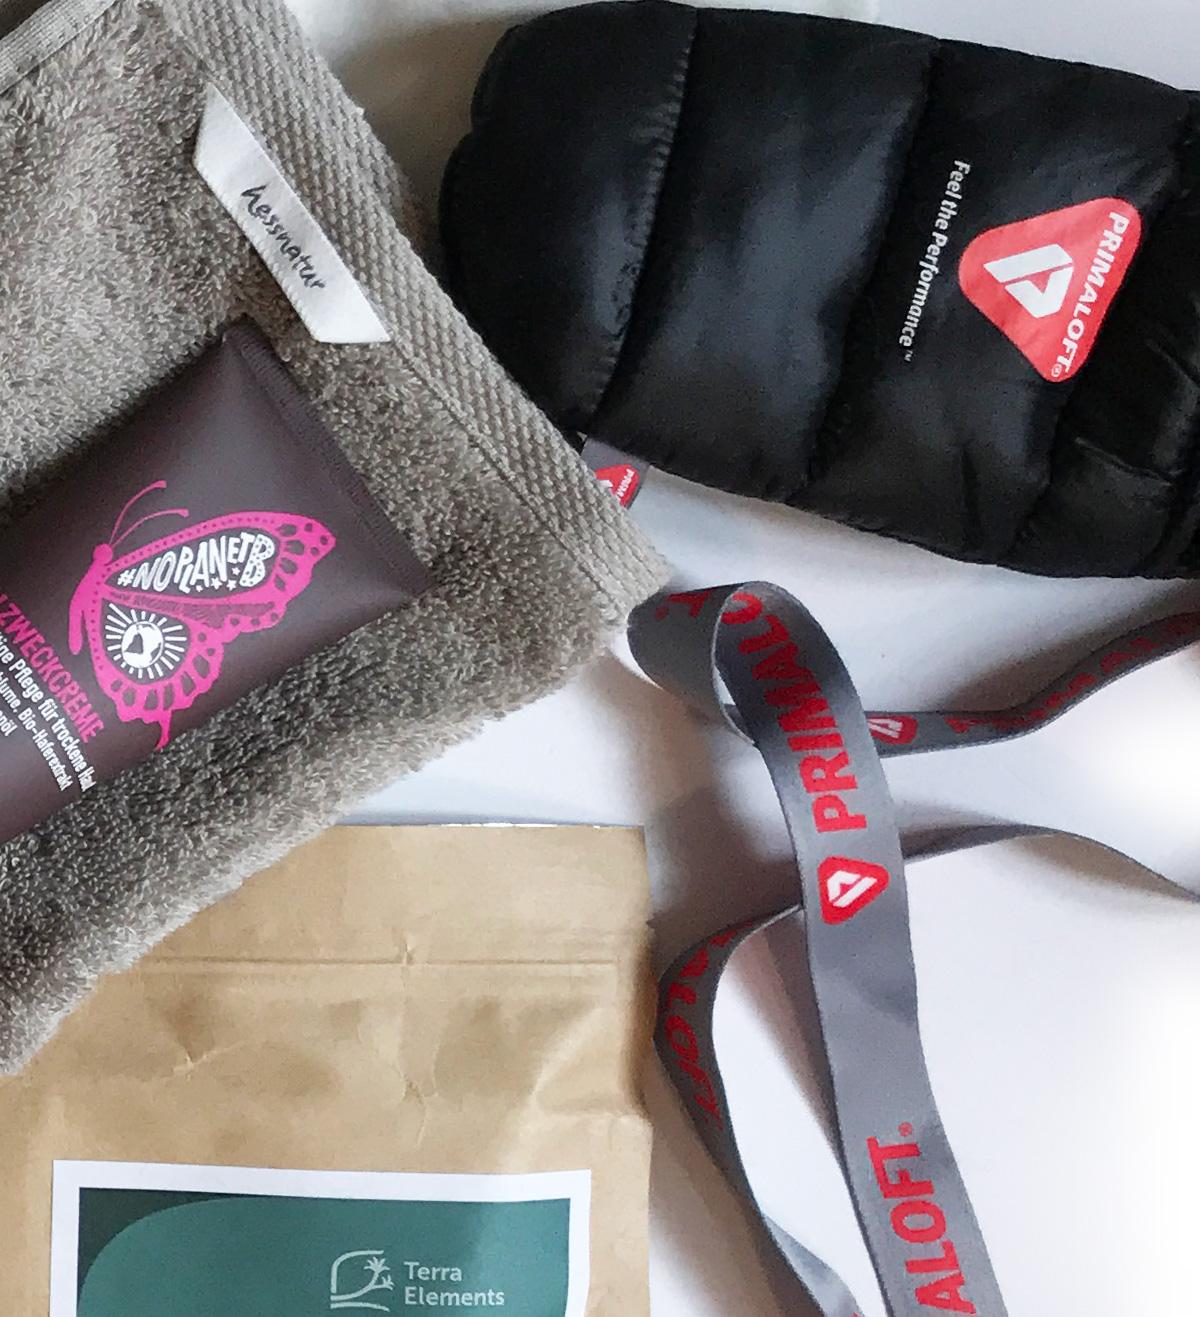 GOOD bag